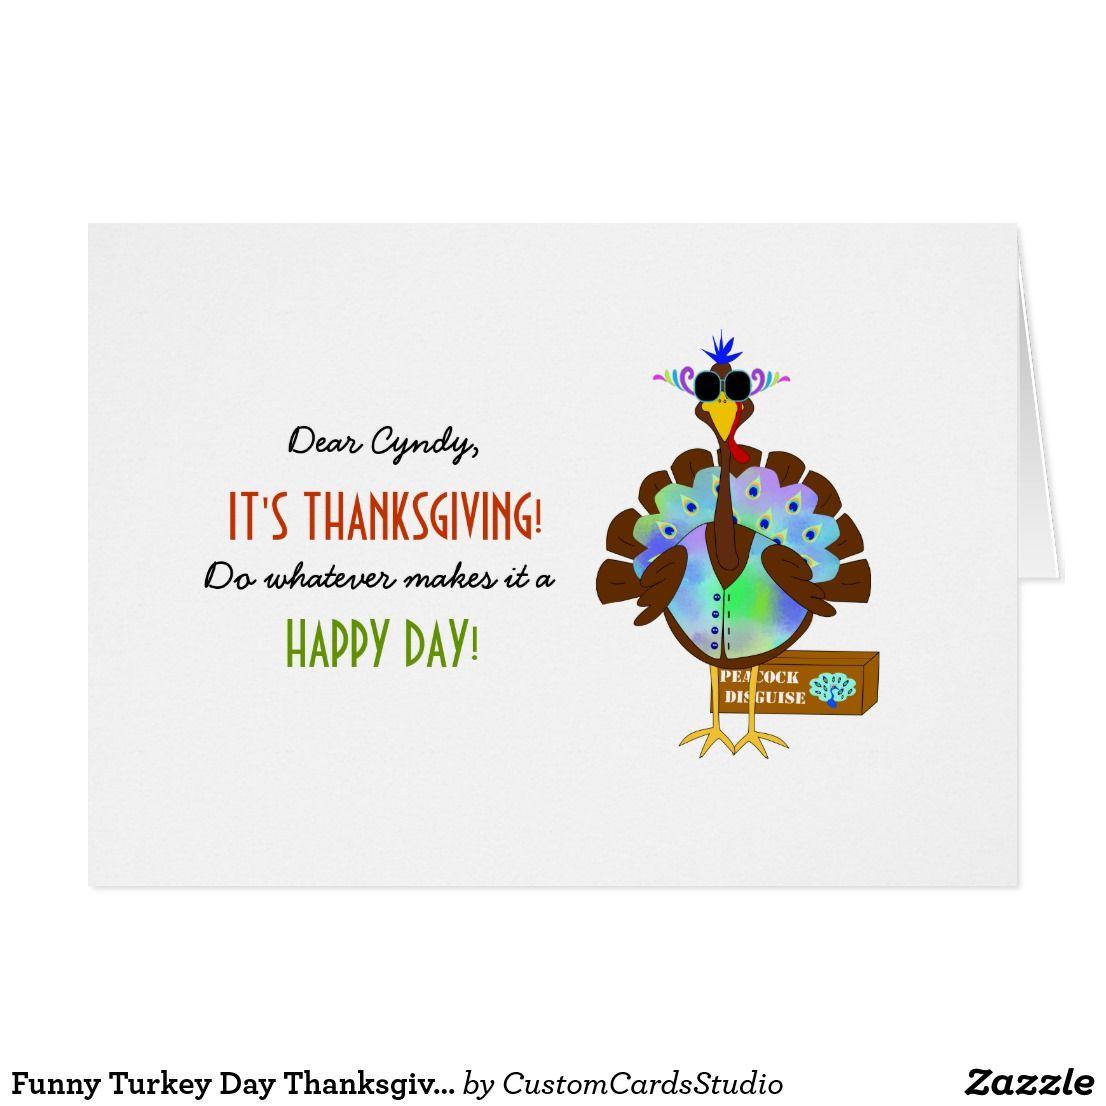 Funny Turkey Day Thanksgiving Greeting Card Funny Turkey